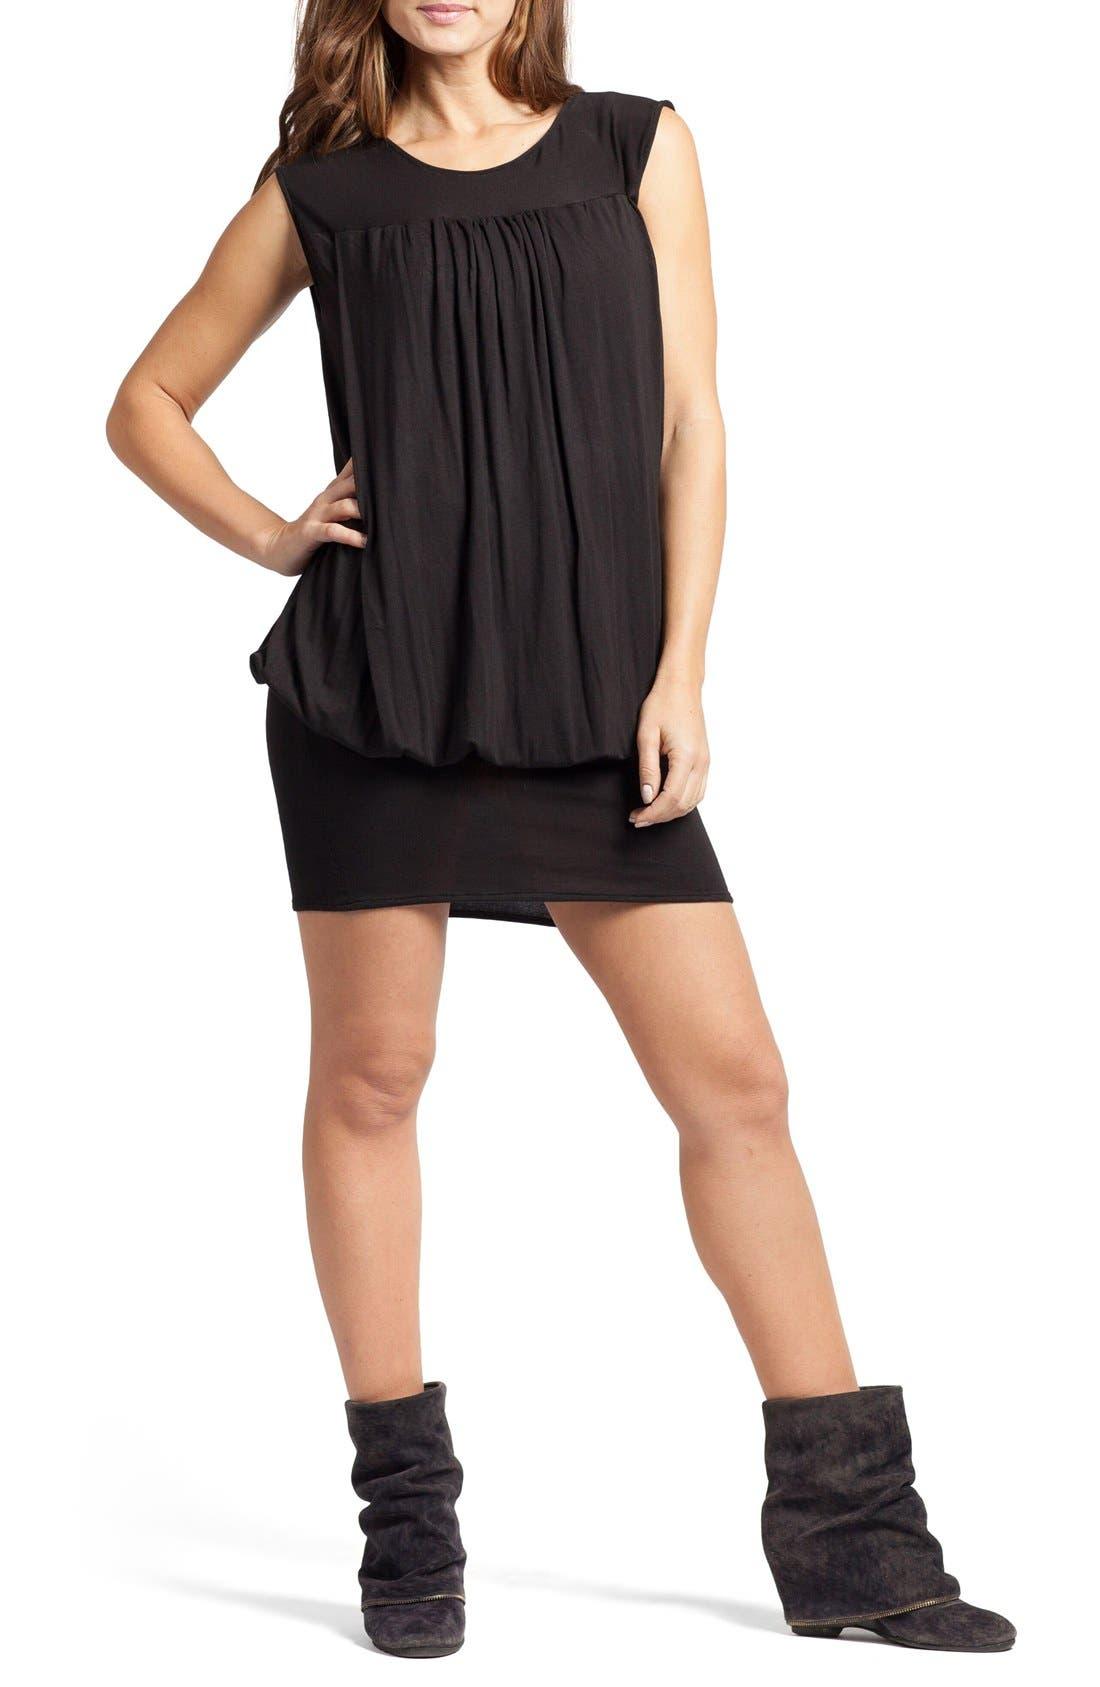 'The Little Black Tulip' Blouson Maternity/Nursing Dress,                         Main,                         color, Black